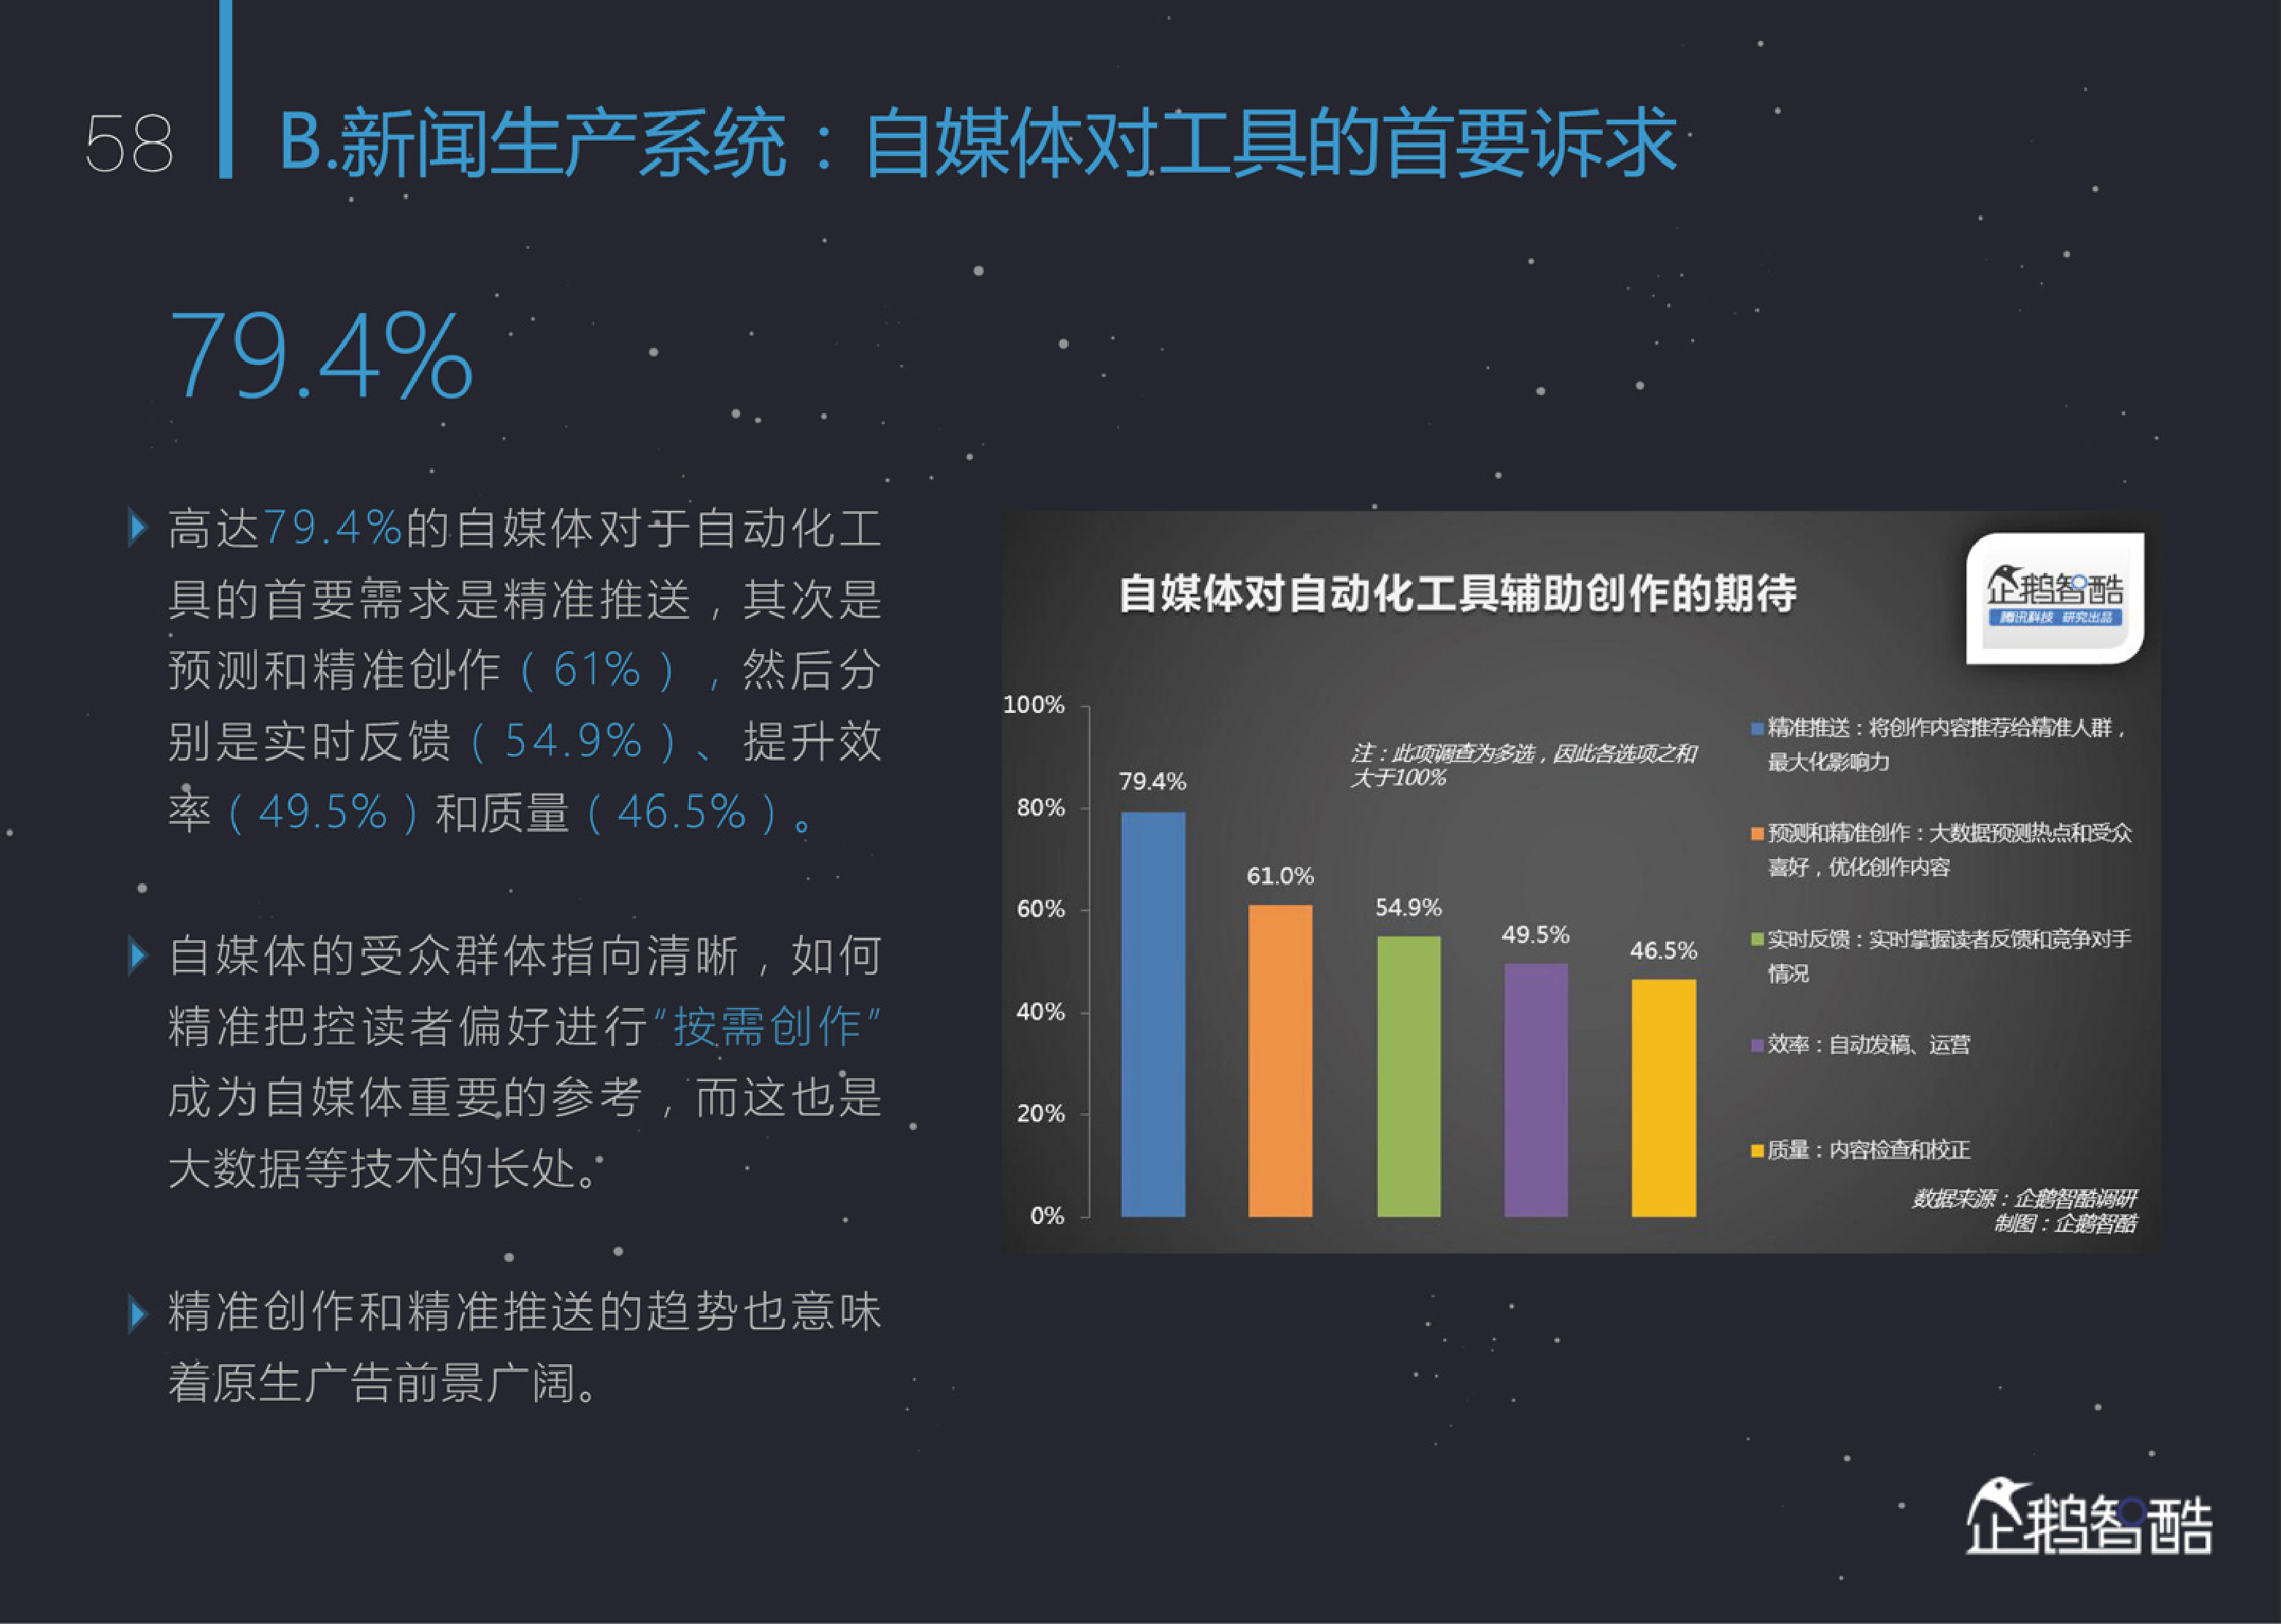 %e6%99%ba%e5%aa%92%e6%9d%a5%e4%b8%b4%ef%bc%9a2016%e4%b8%ad%e5%9b%bd%e6%96%b0%e5%aa%92%e4%bd%93%e8%b6%8b%e5%8a%bf%e6%8a%a5%e5%91%8a-%e4%bc%81%e9%b9%85%e6%99%ba%e9%85%b7_000059